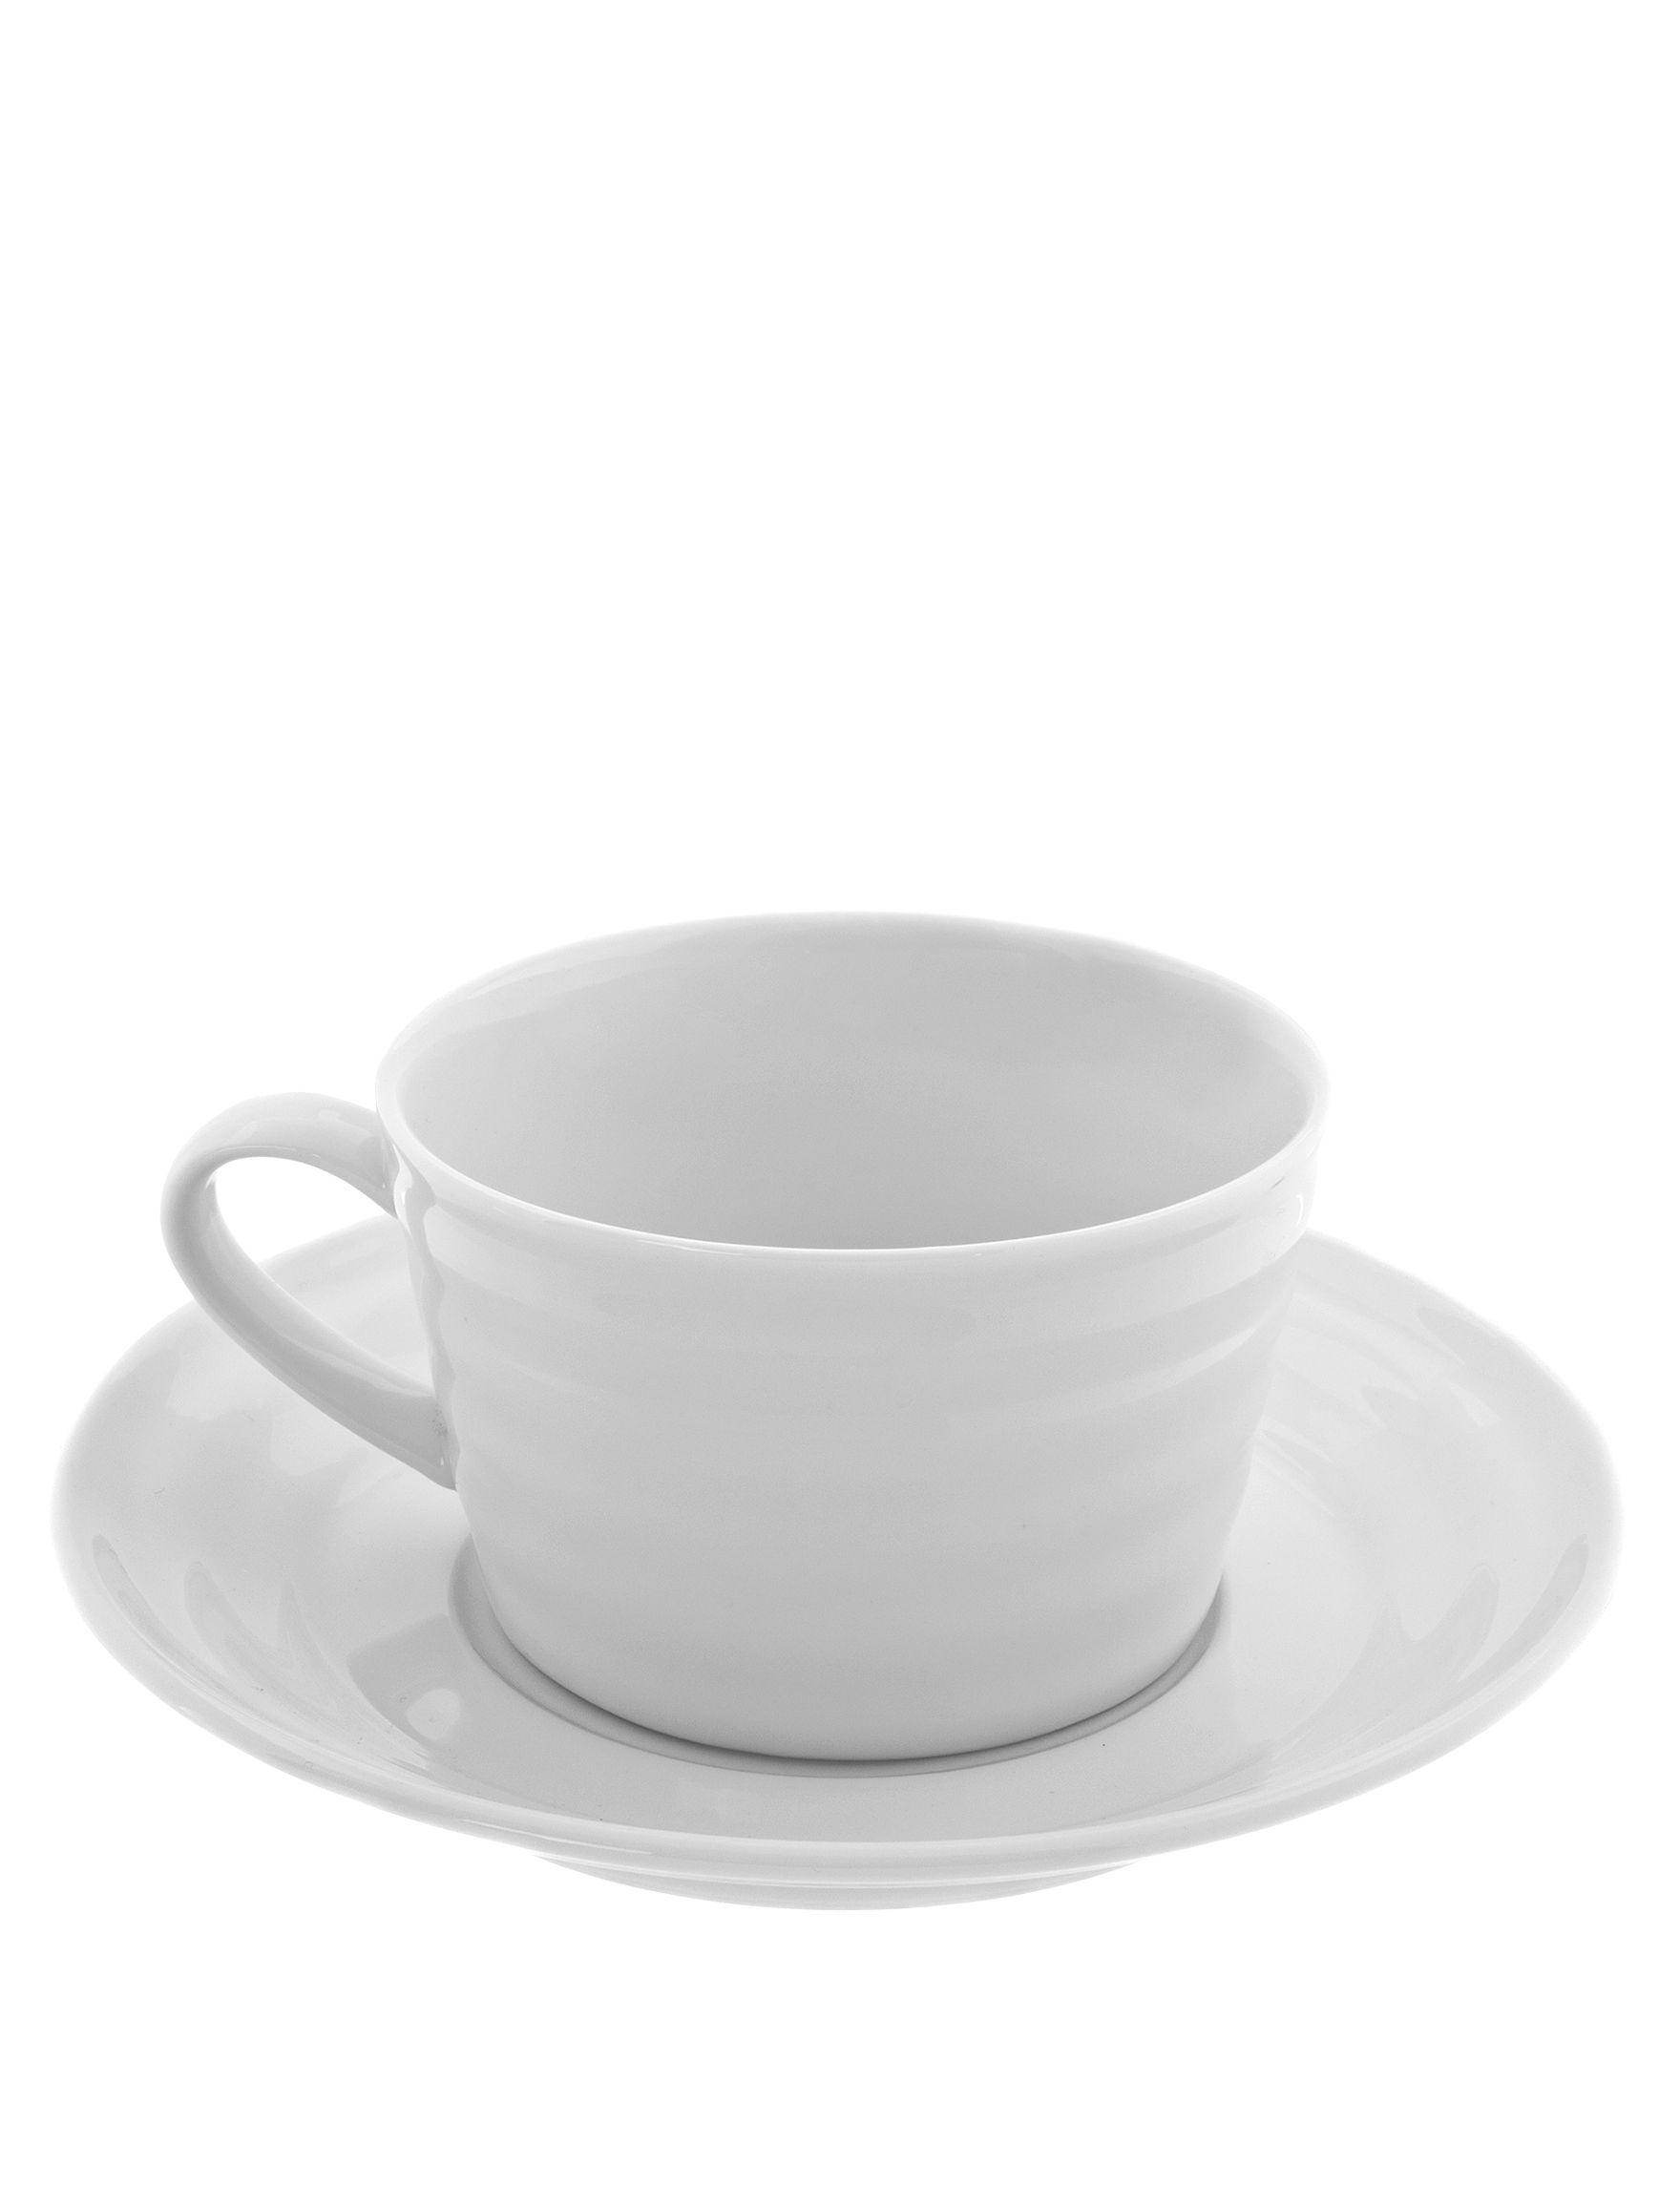 10 Strawberry Street Porcelain Mugs Drinkware